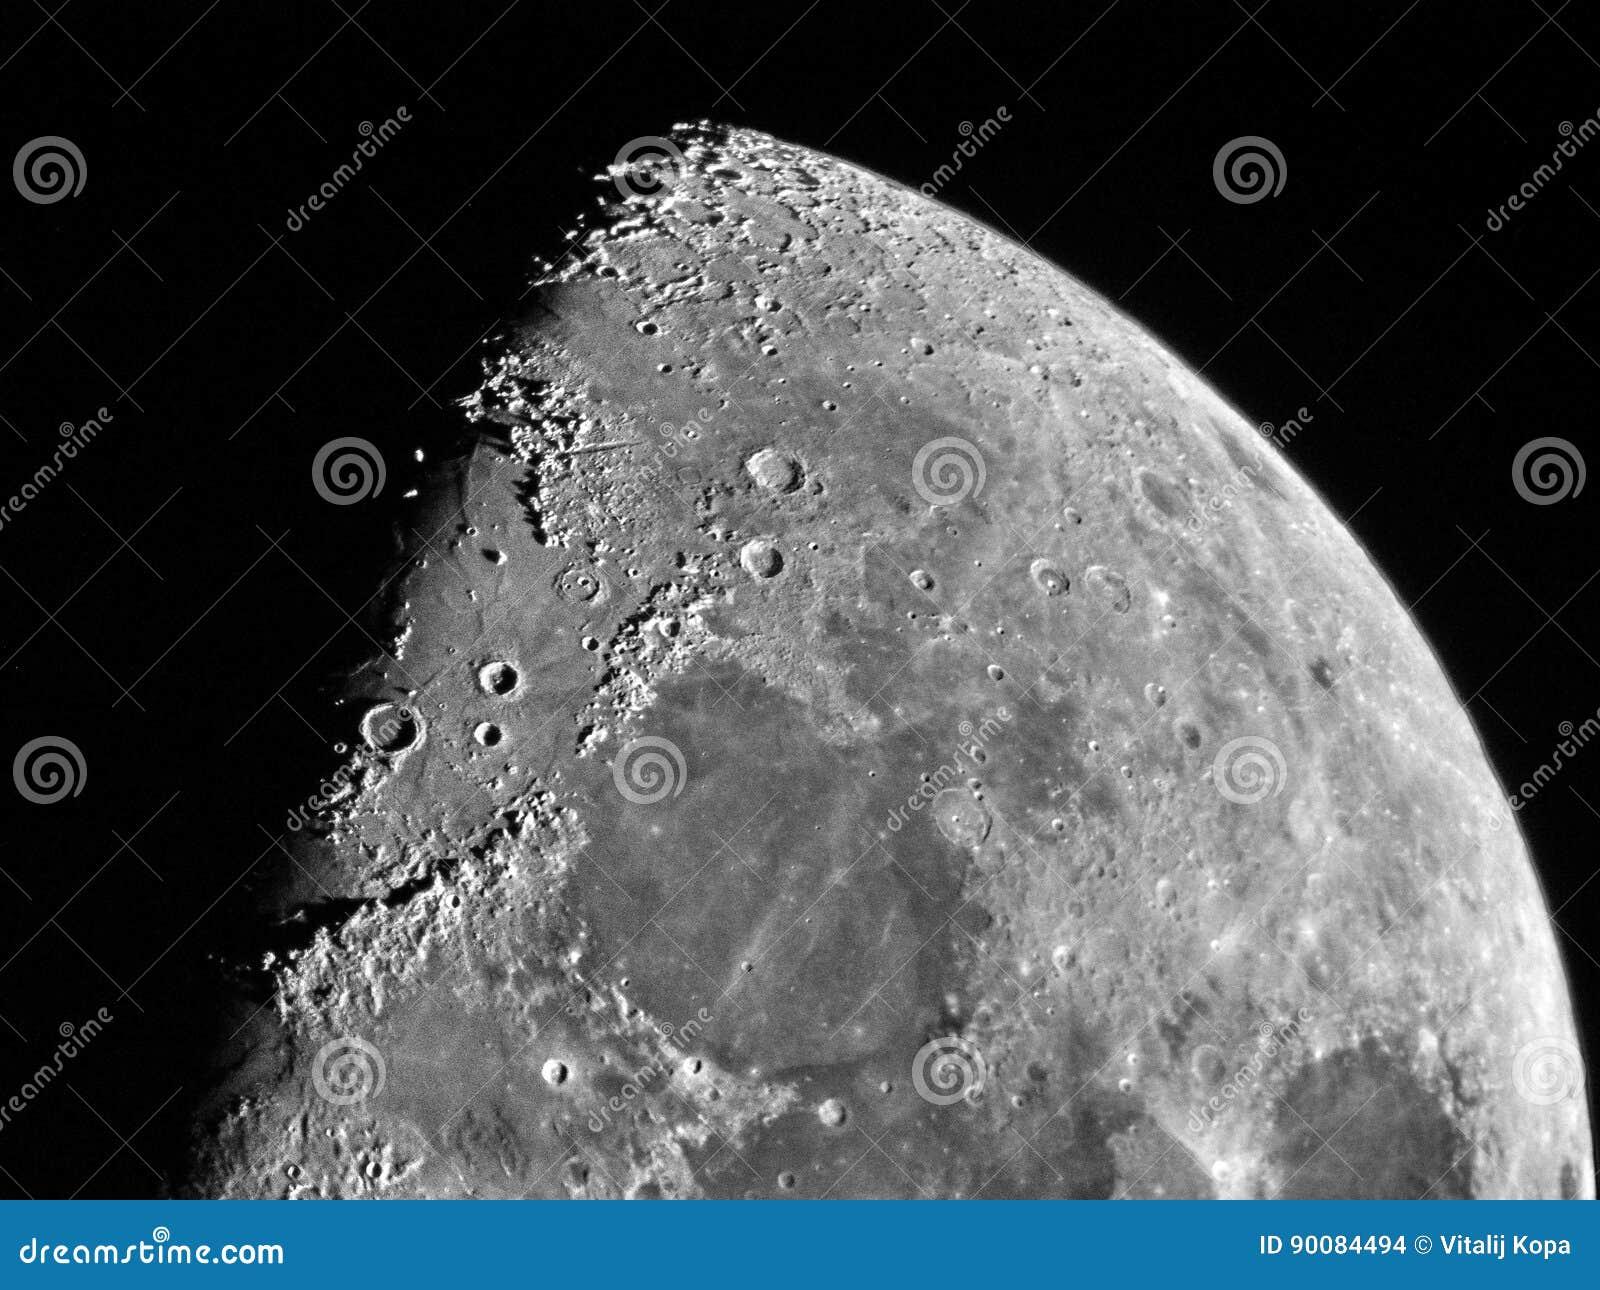 21 Half Moon Craters Photos   Free & Royalty Free Stock Photos ...